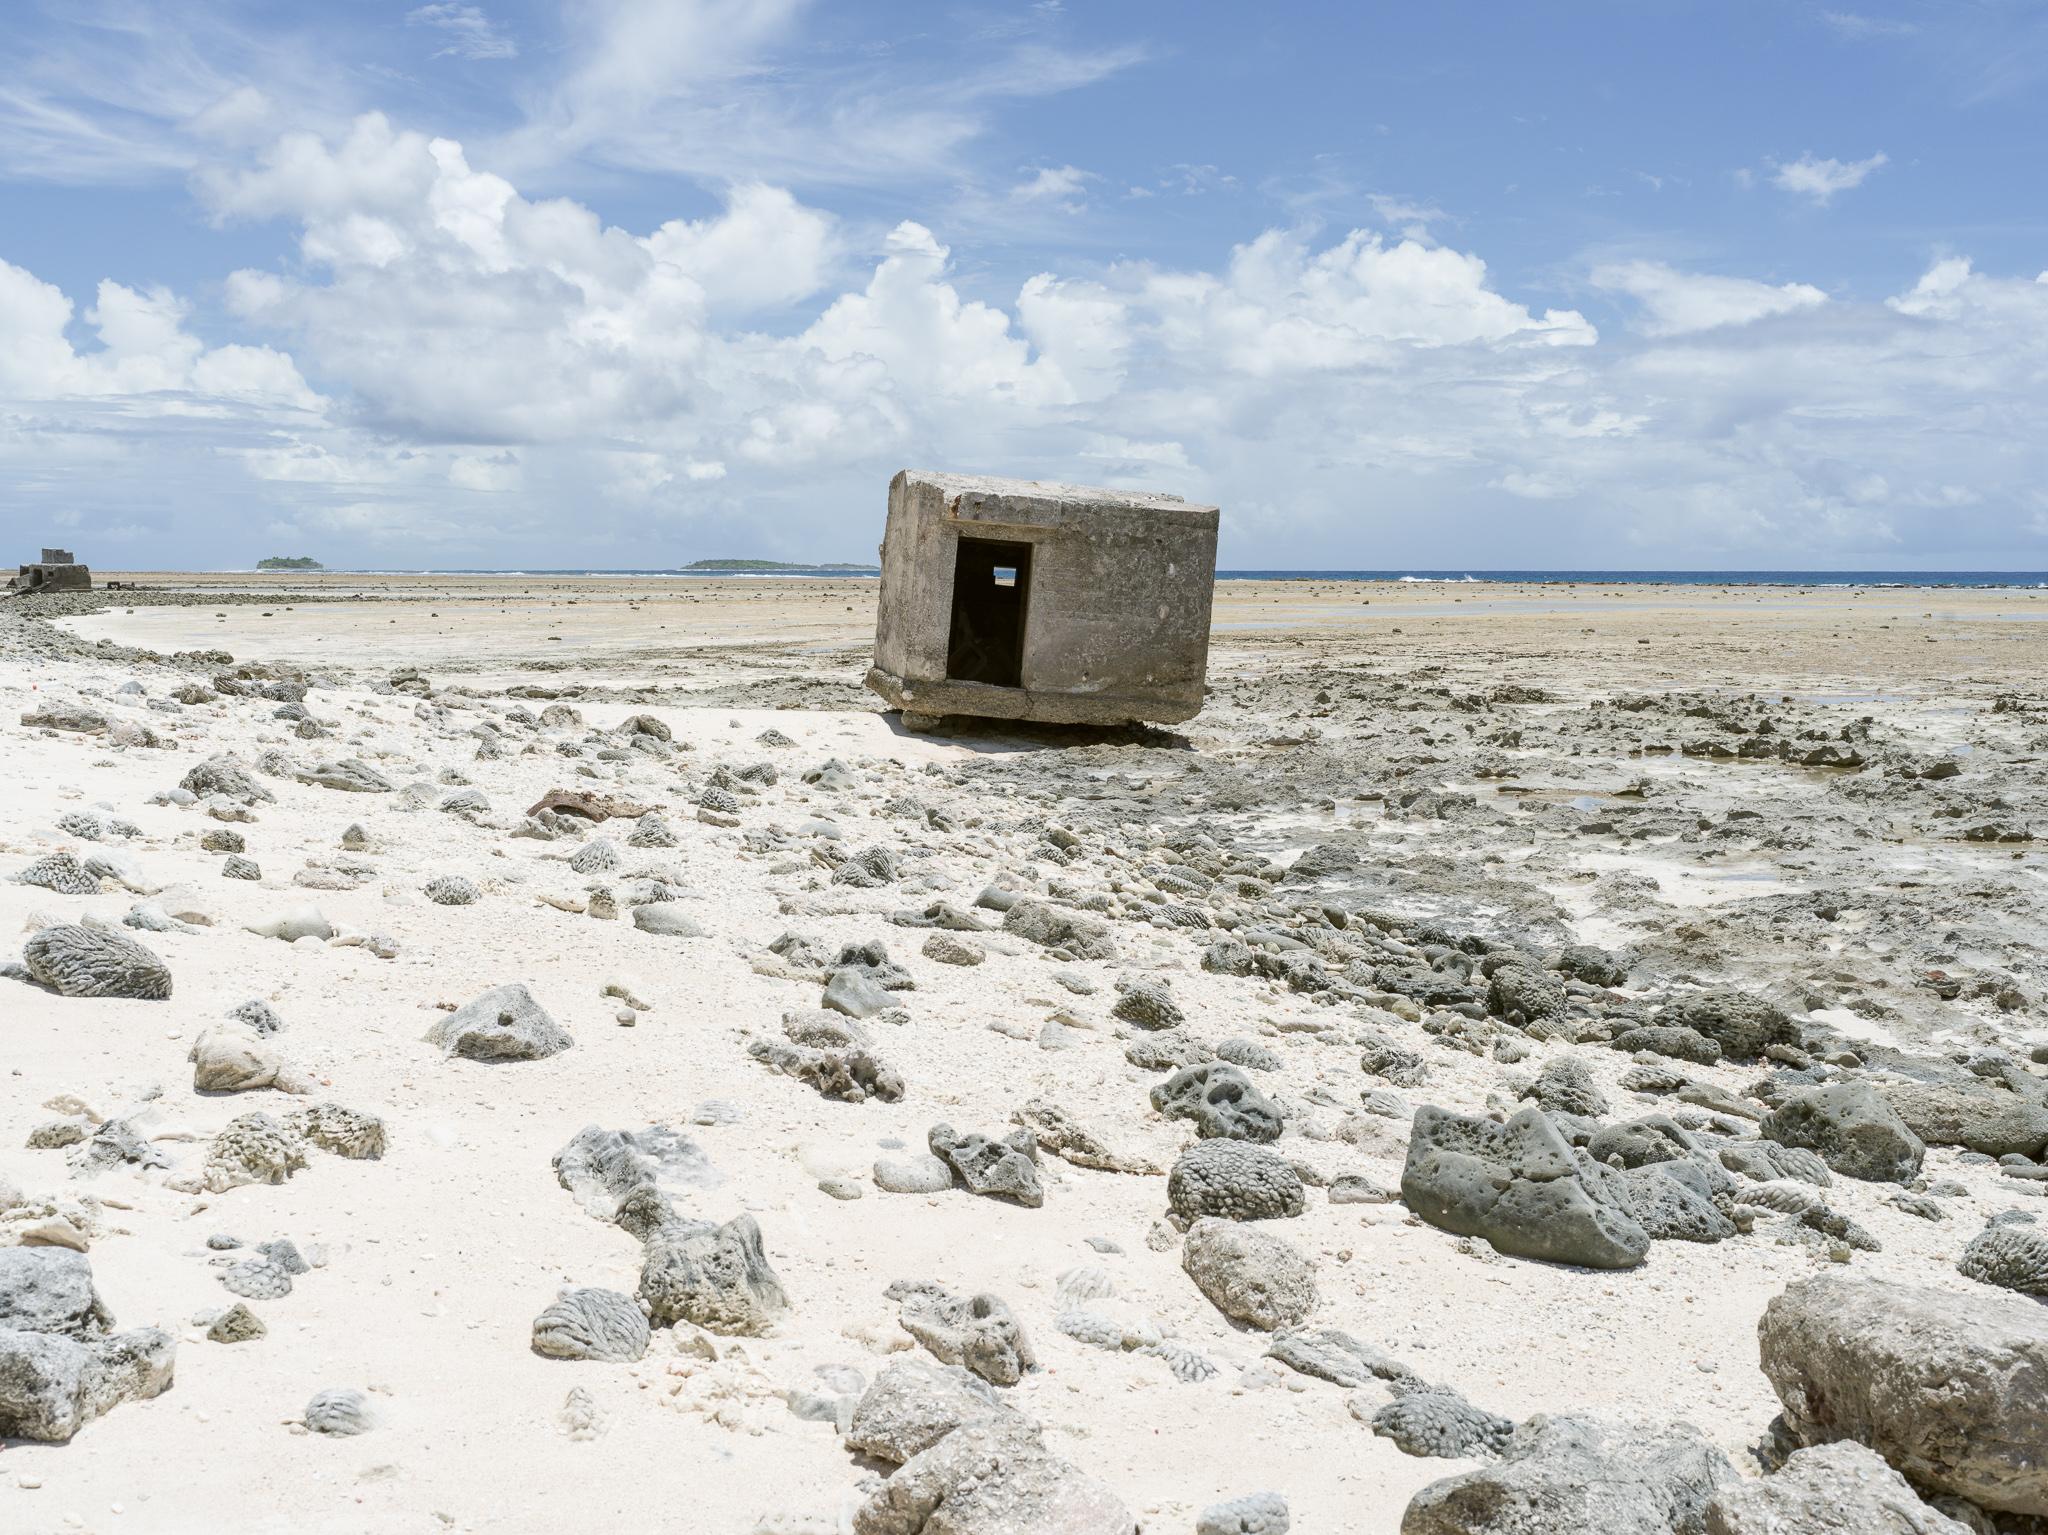 Japanese pillbox dislodged by the sea, Taroa Island, Maloelap Atoll, Marshall Islands_Matthew Arnold